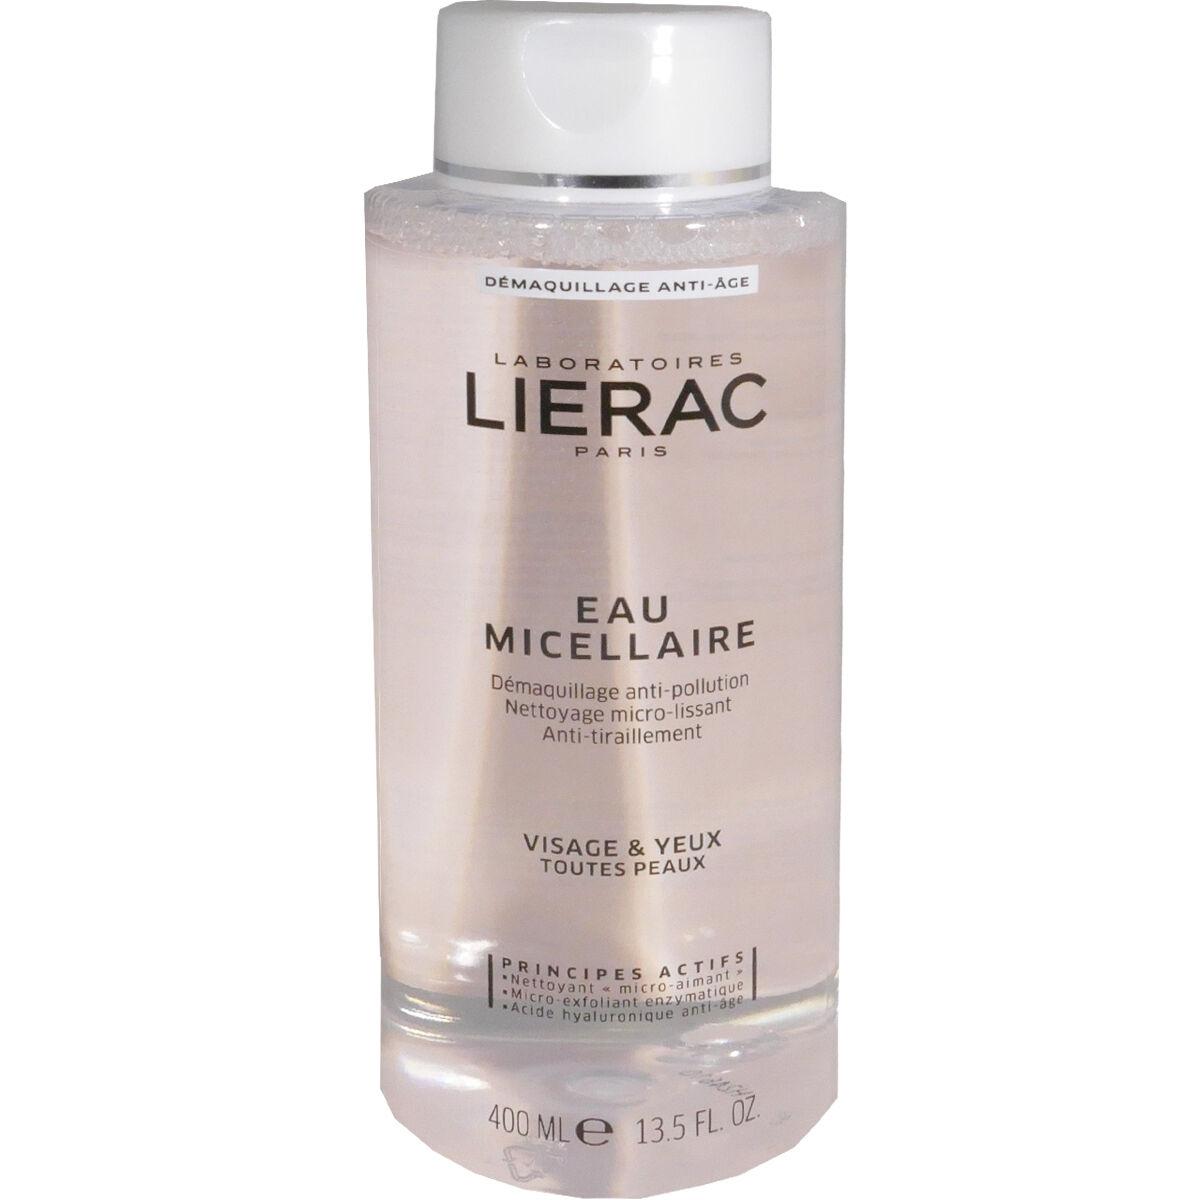 Lierac eau micellaire visage & yeux 400 ml